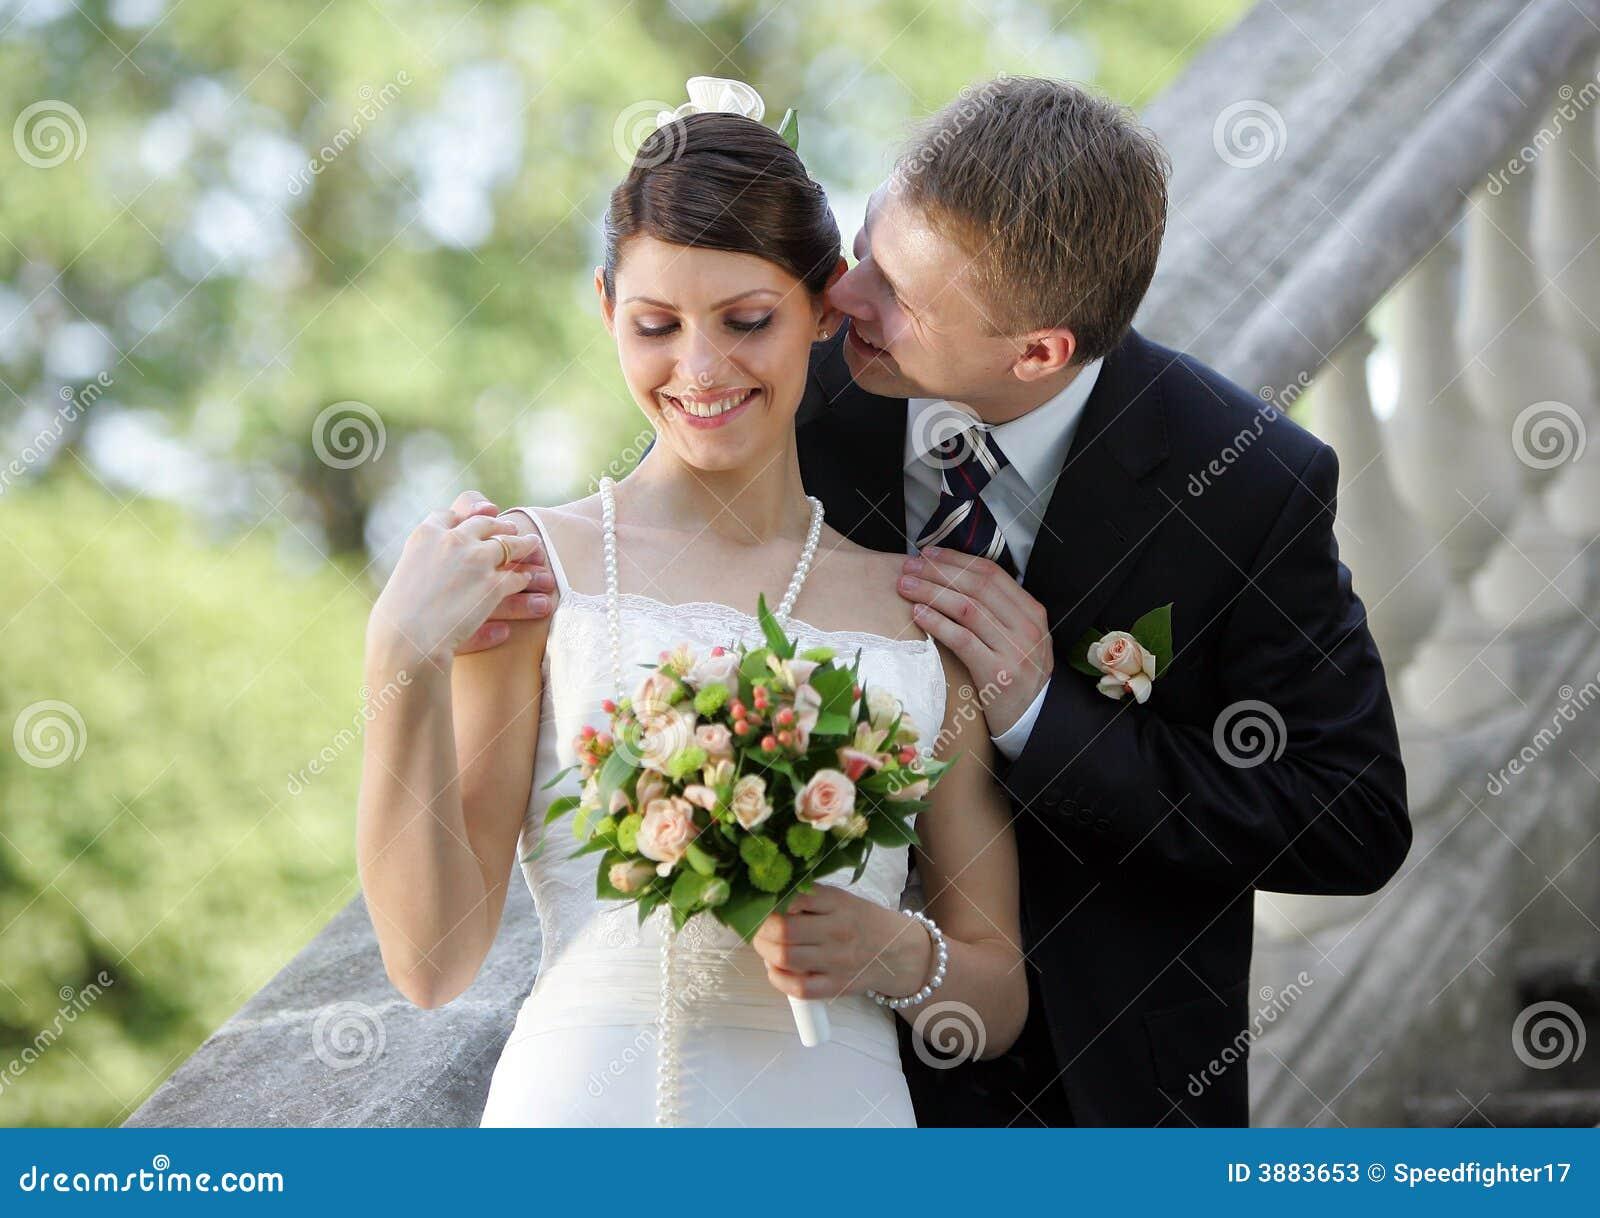 couple romancing photography 8od